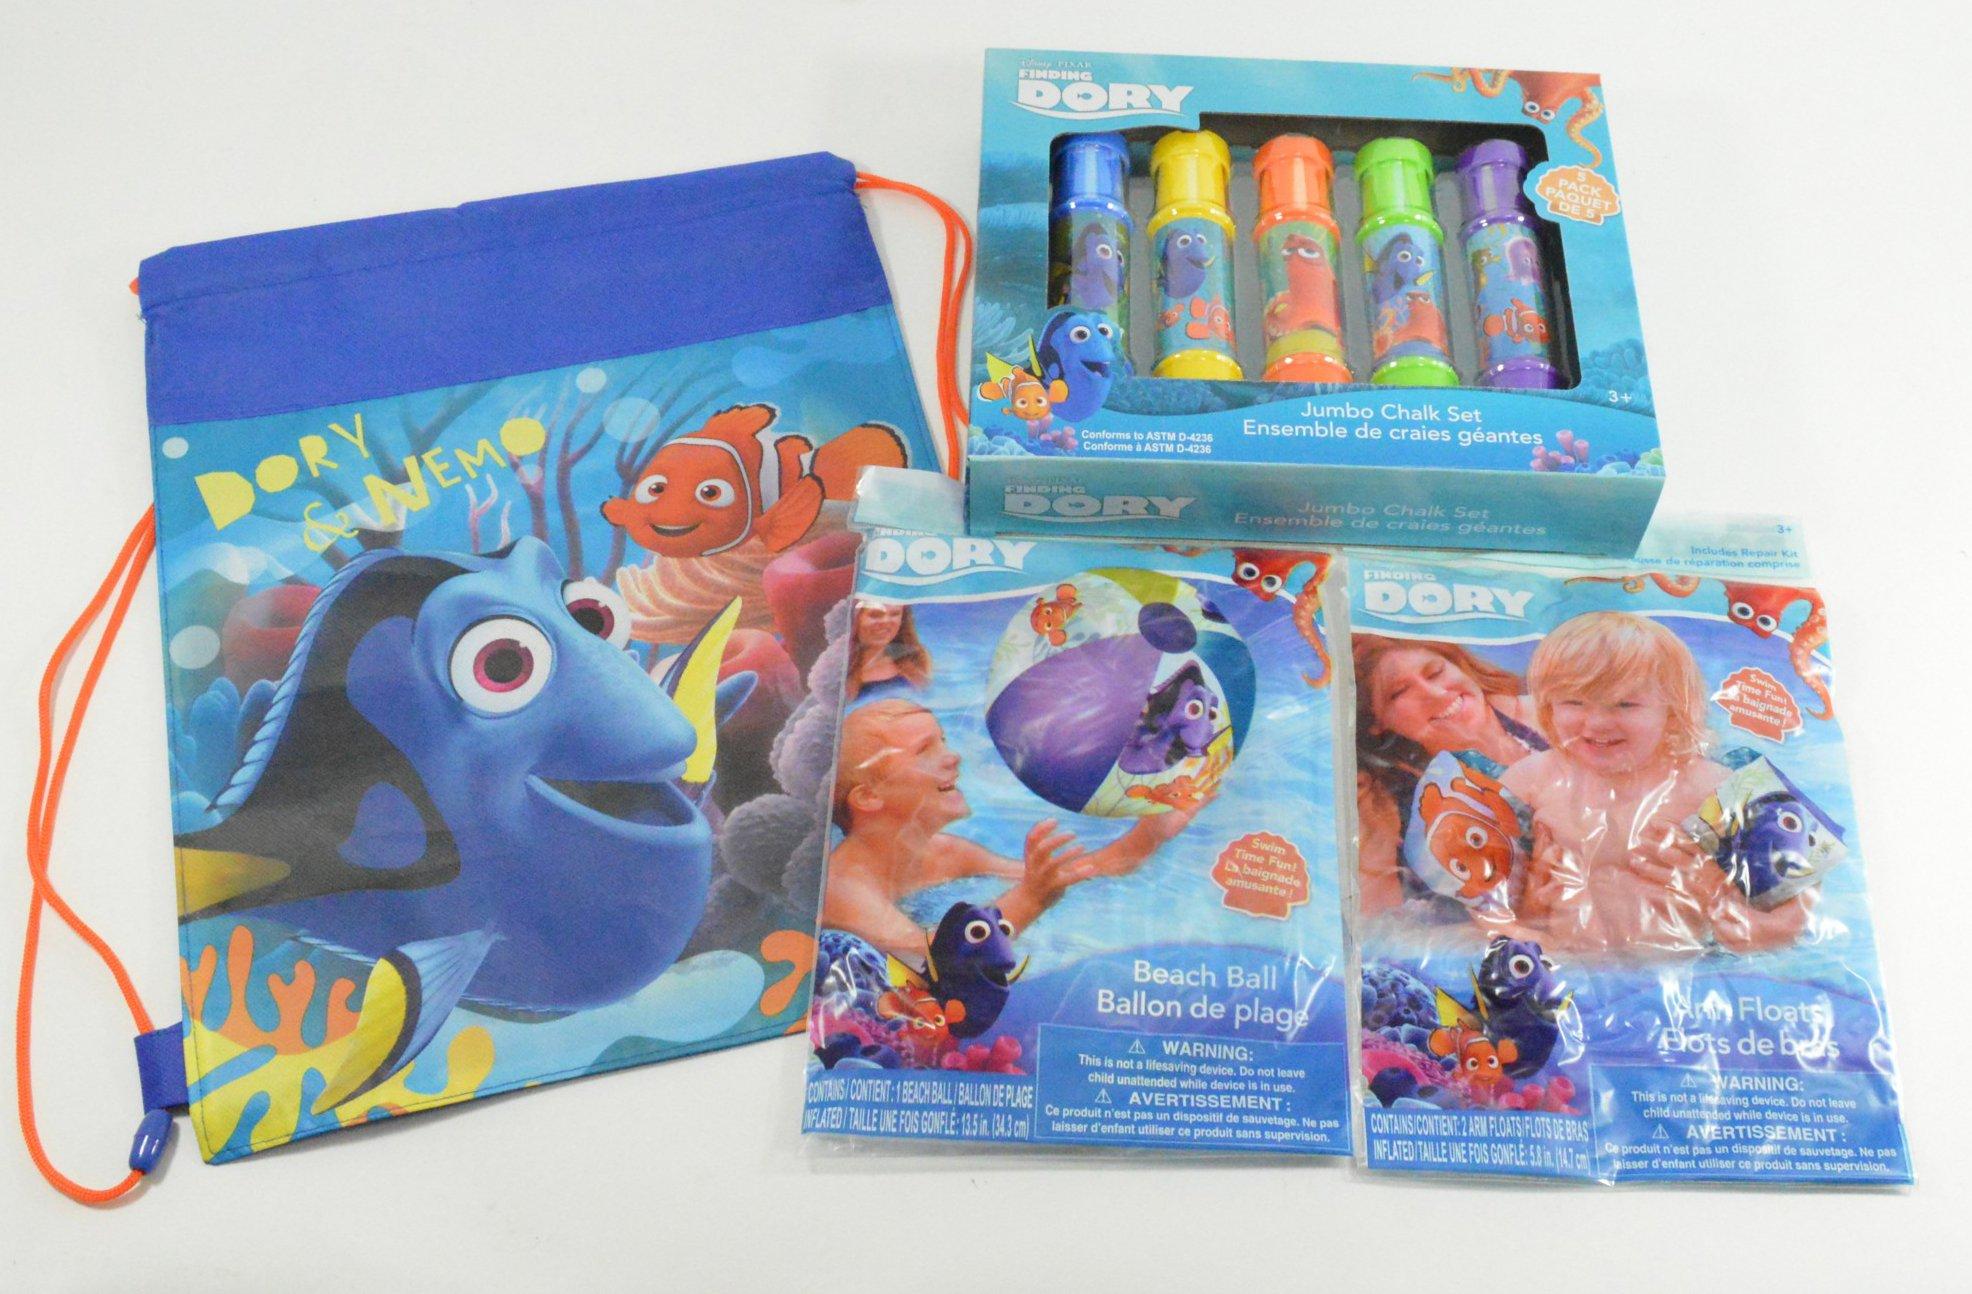 Disney Pixar Finding Dory Bag and Outdoor Fun Pool Package Deal (Chalk, Beach Ball, Bag, Floaties)